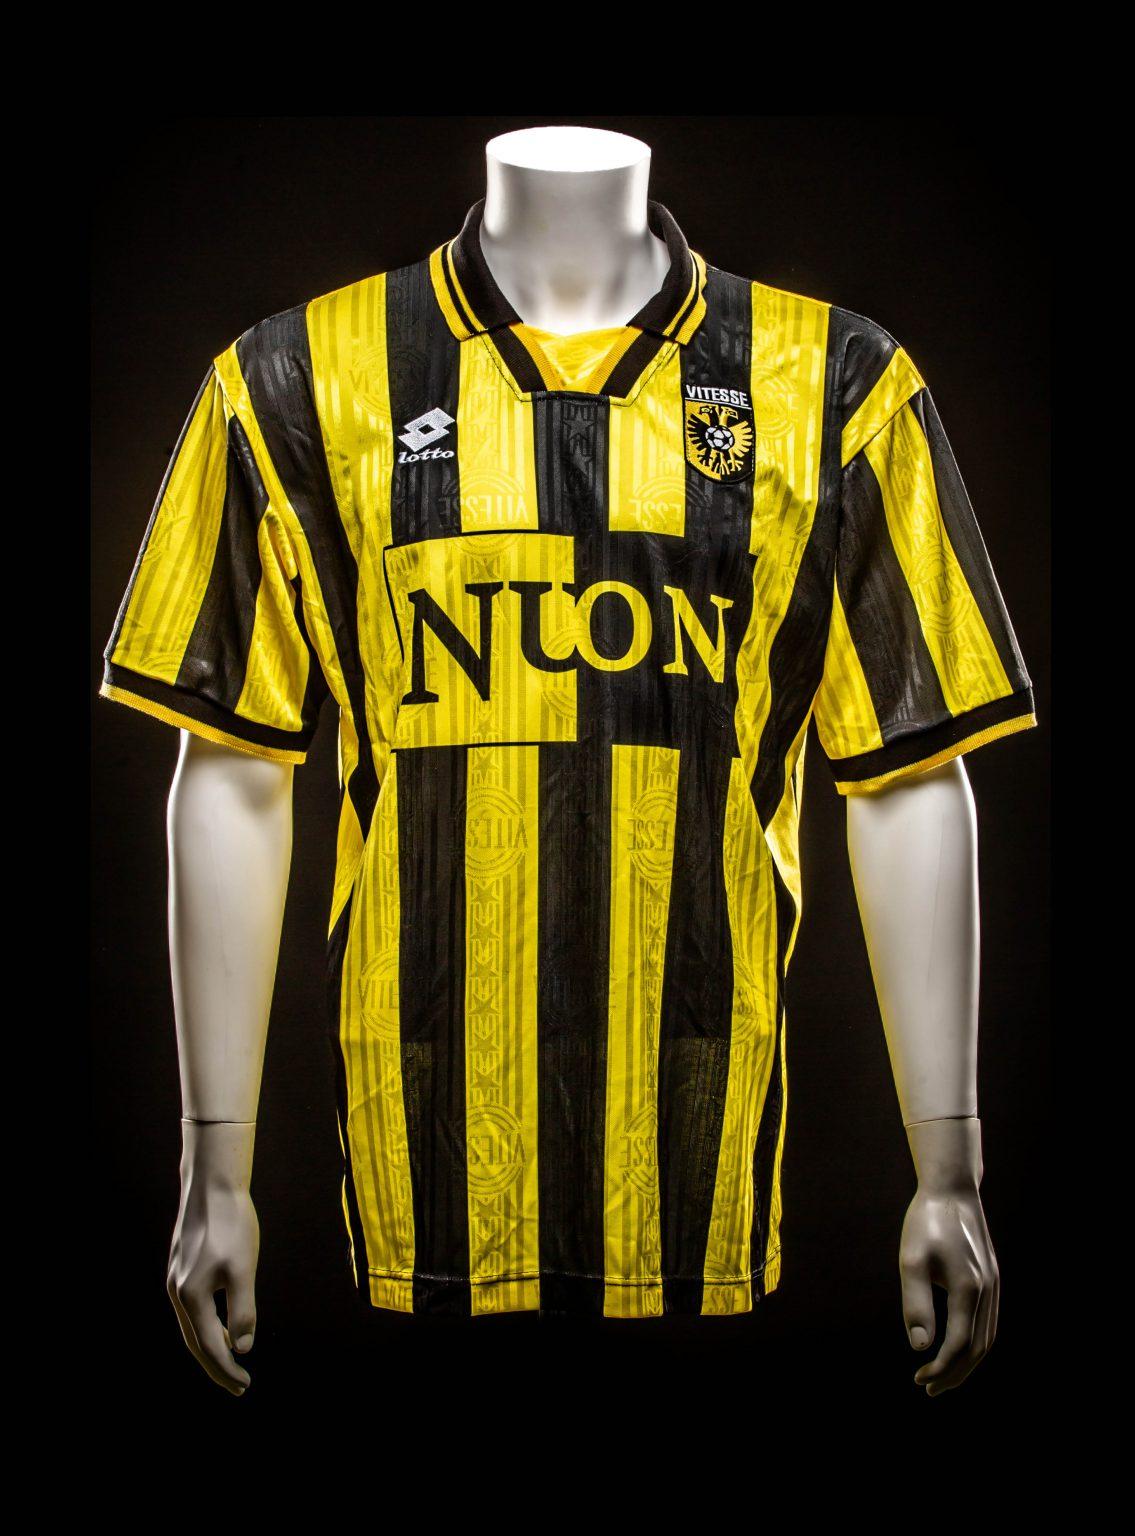 #26 Orlando Trustfull Vitesse 1997-1999